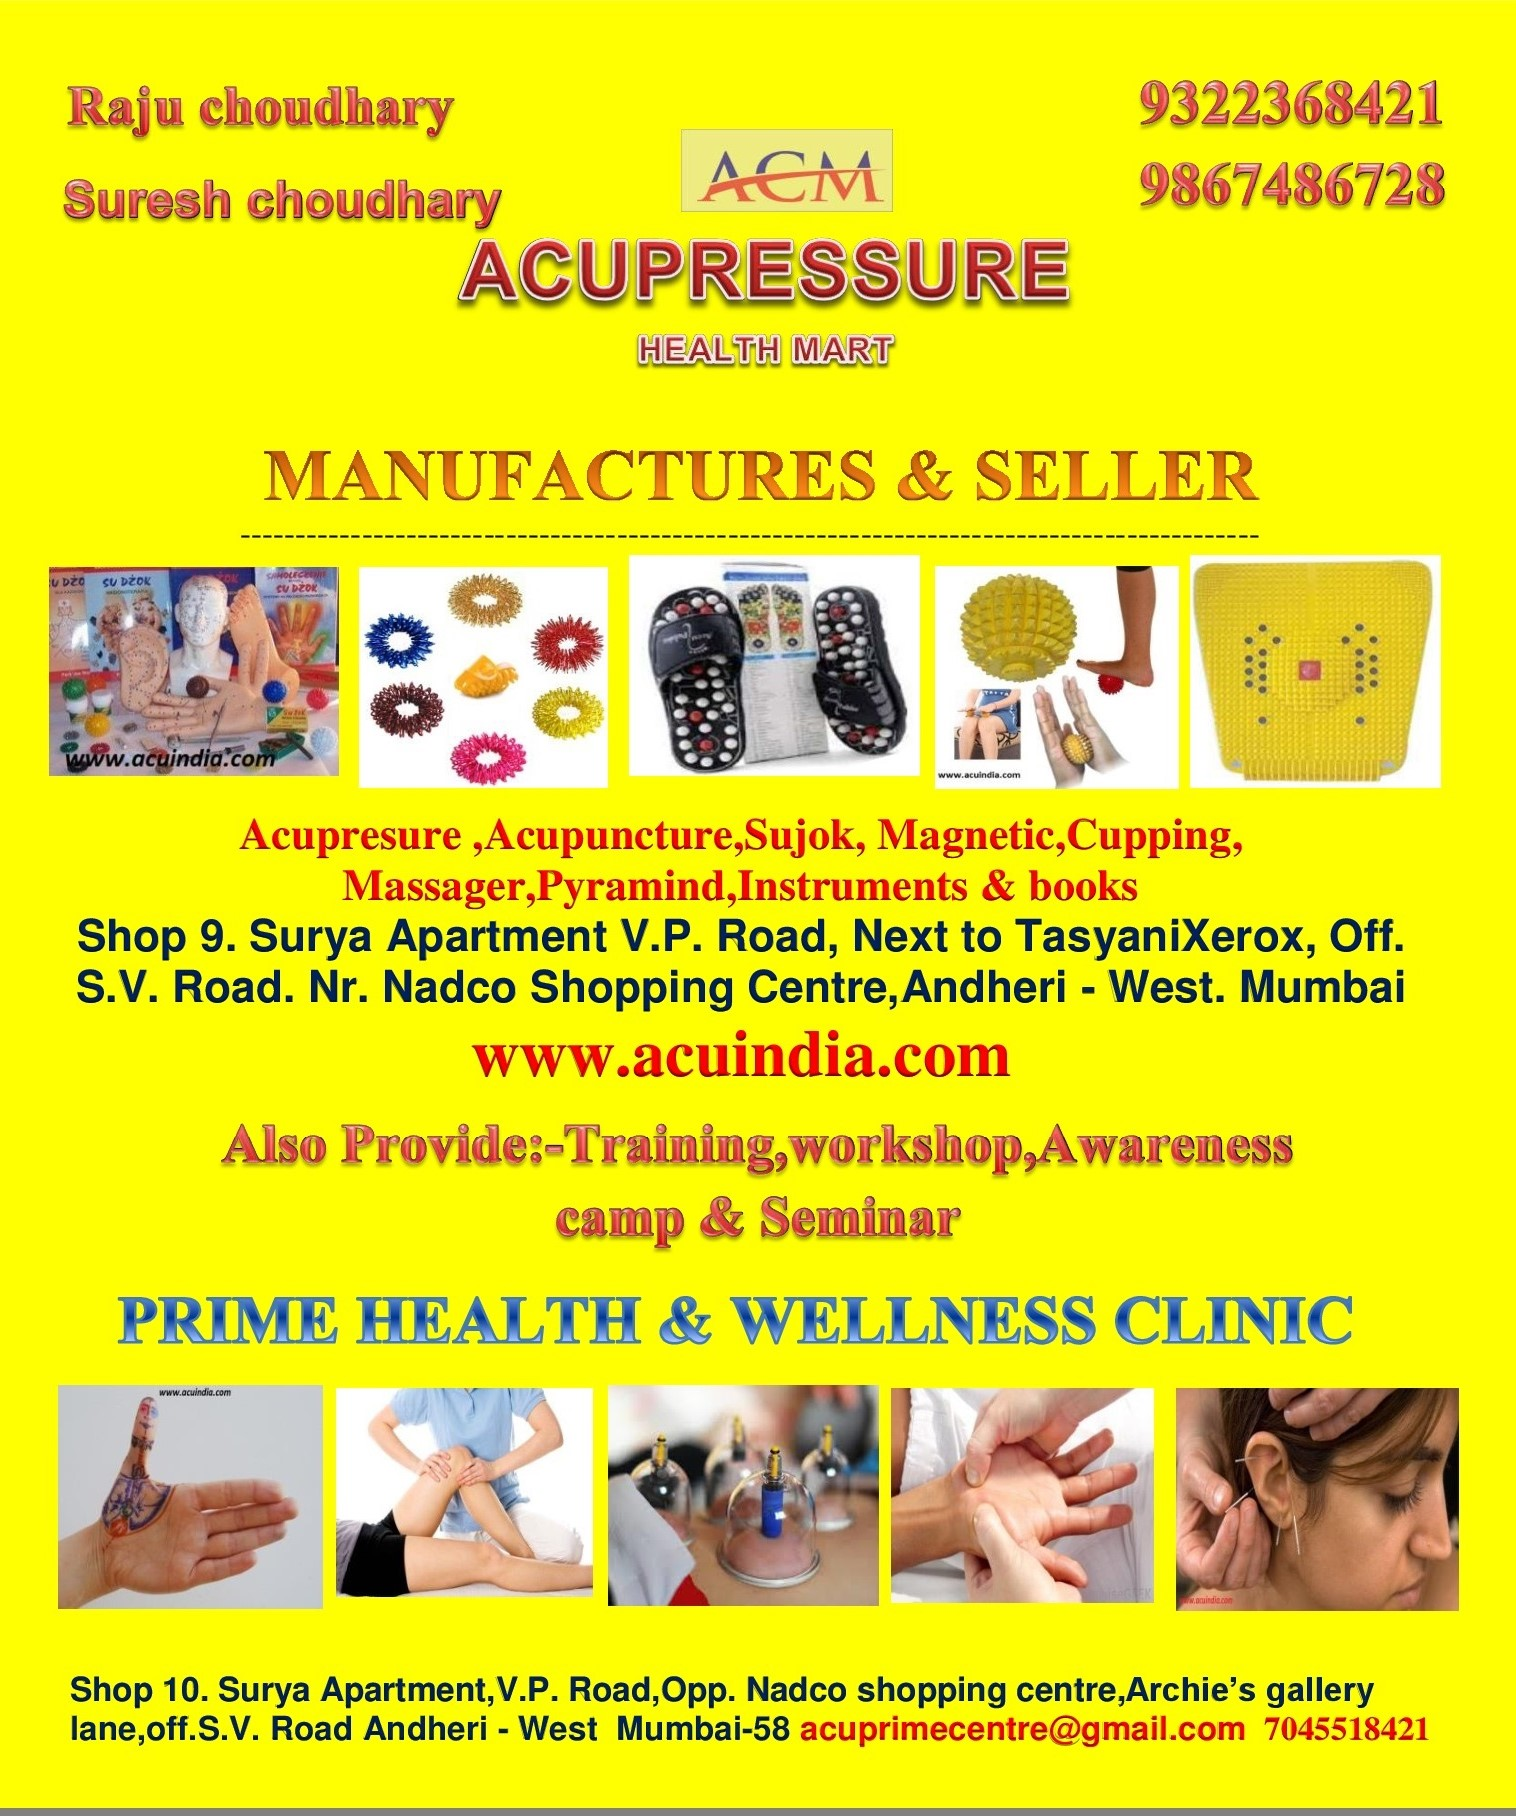 PRIME HEALTH & WELLNESS CLINIC